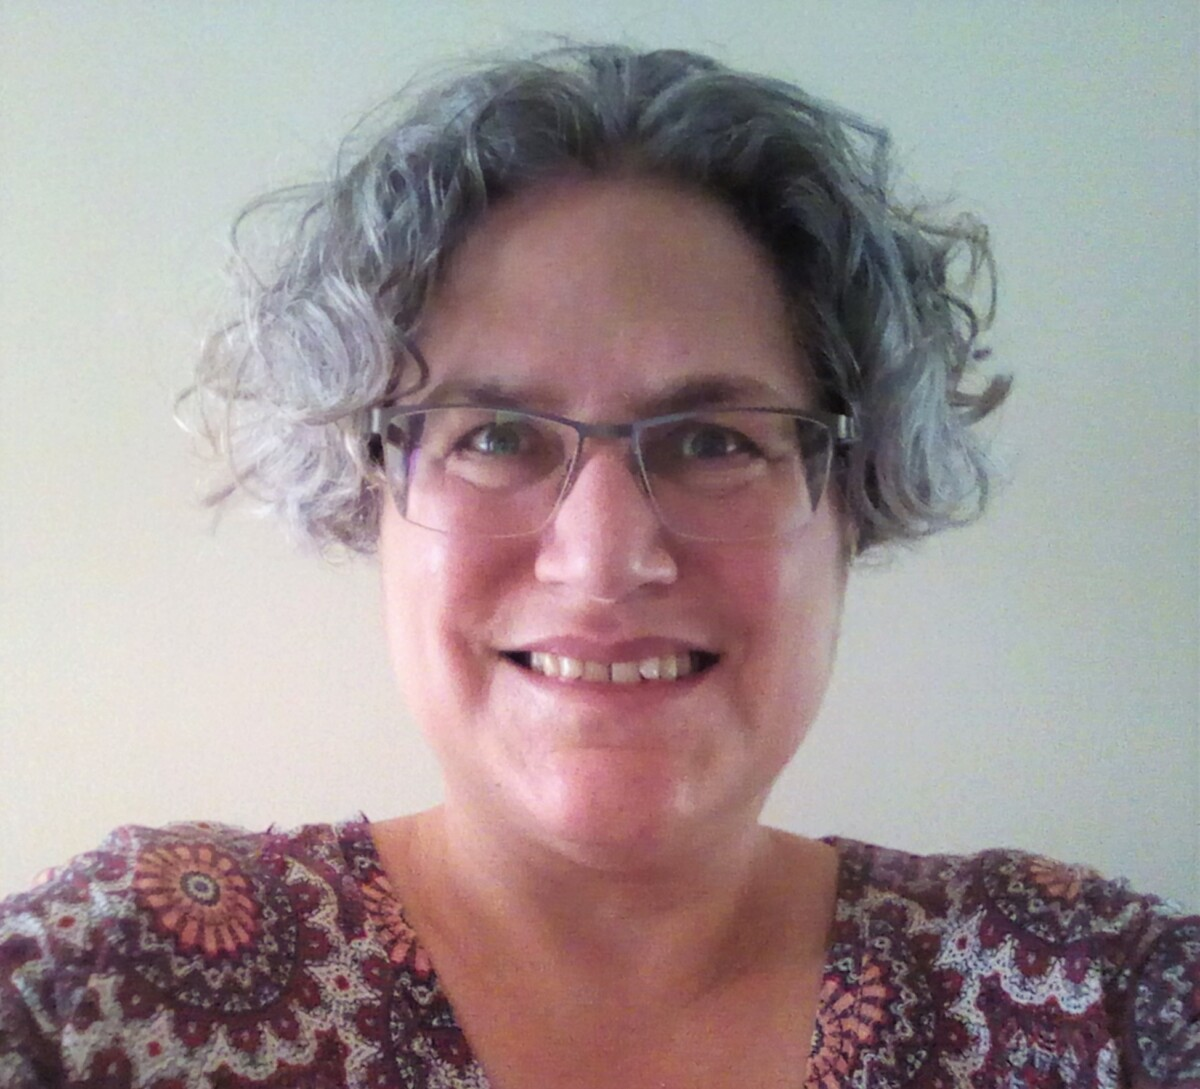 Helen Altshul BSc (Hons) MSc